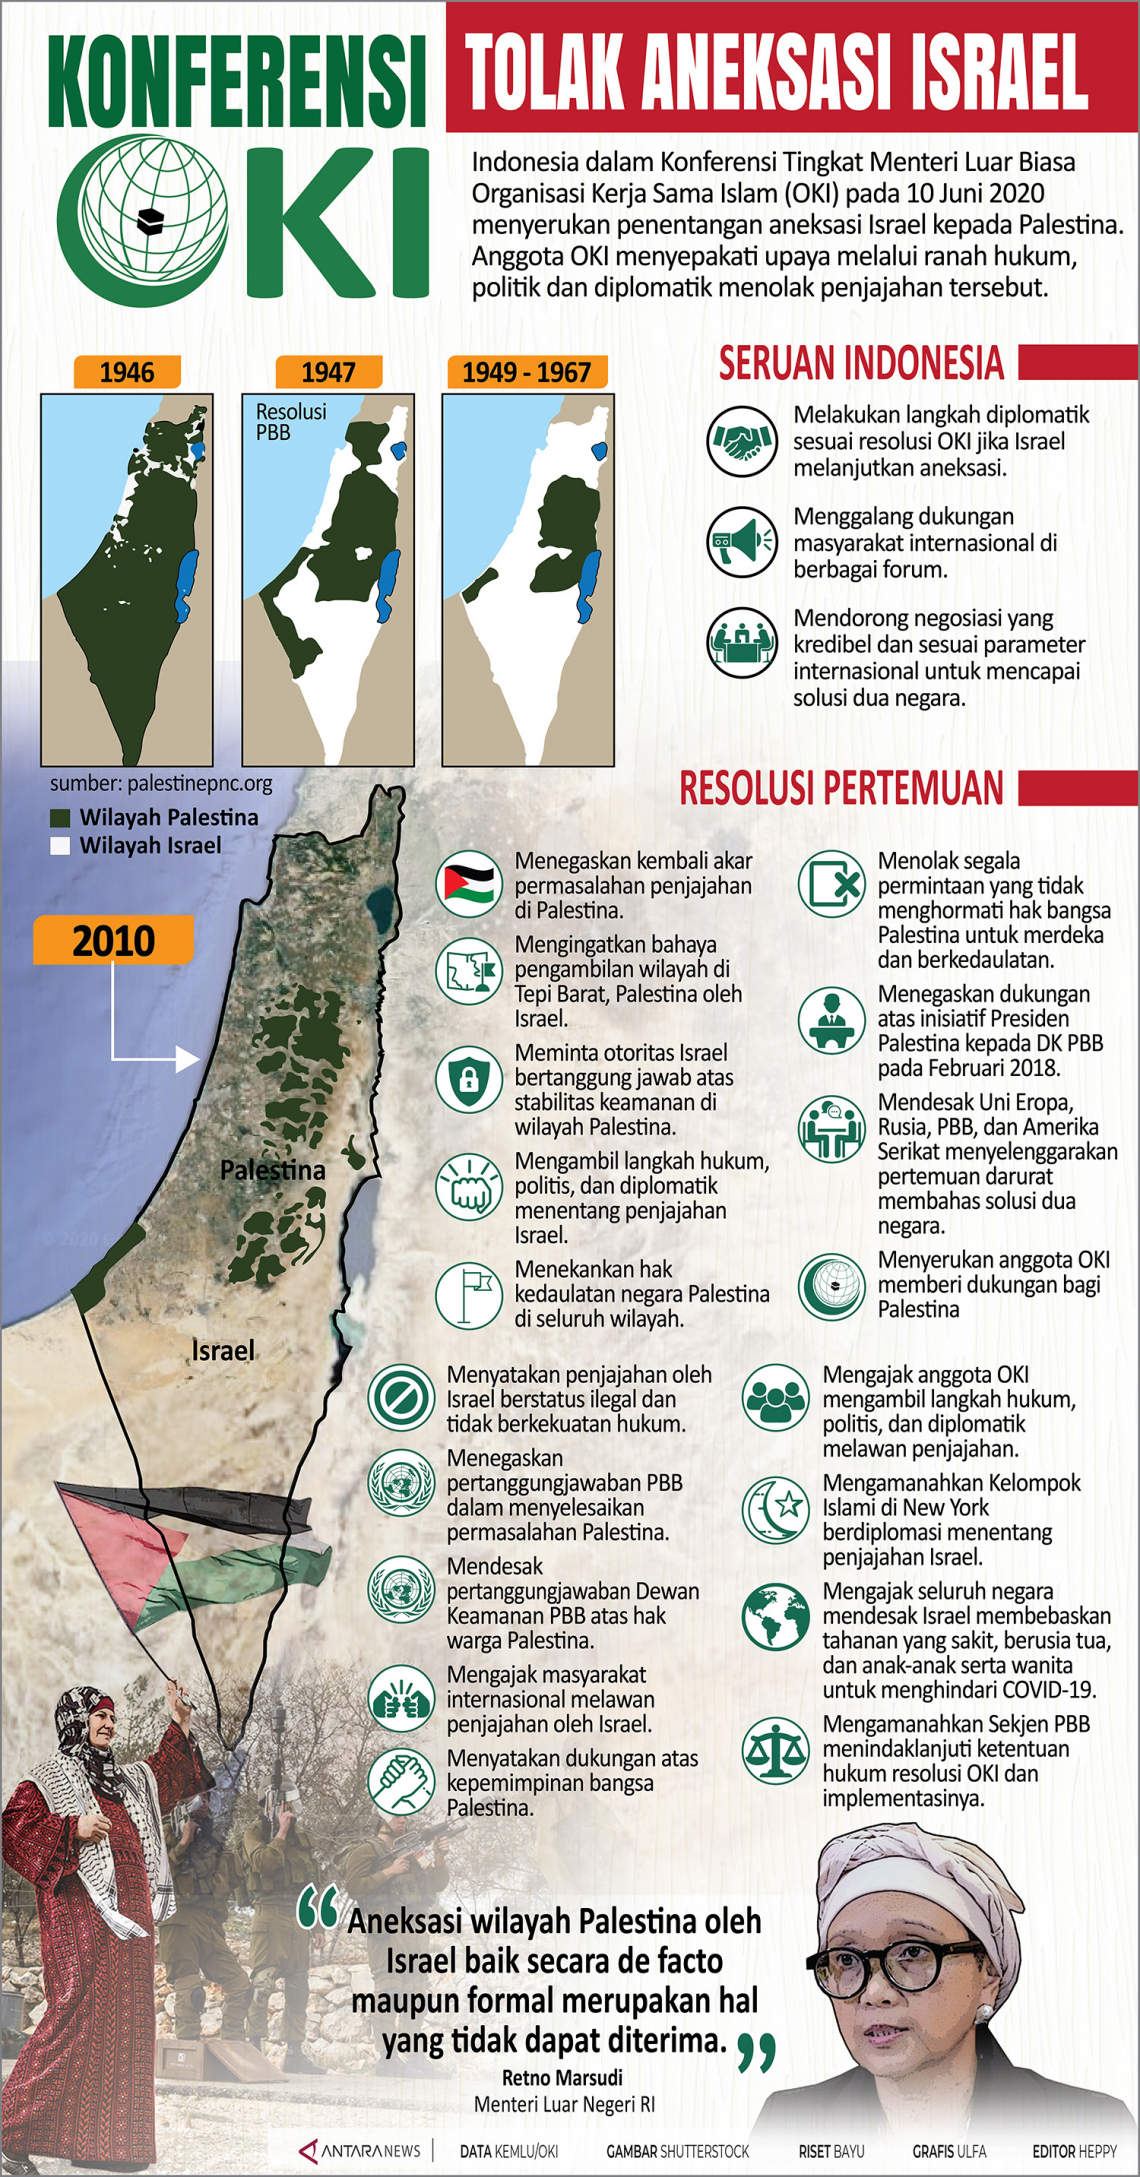 Konferensi OKI tolak aneksasi Israel